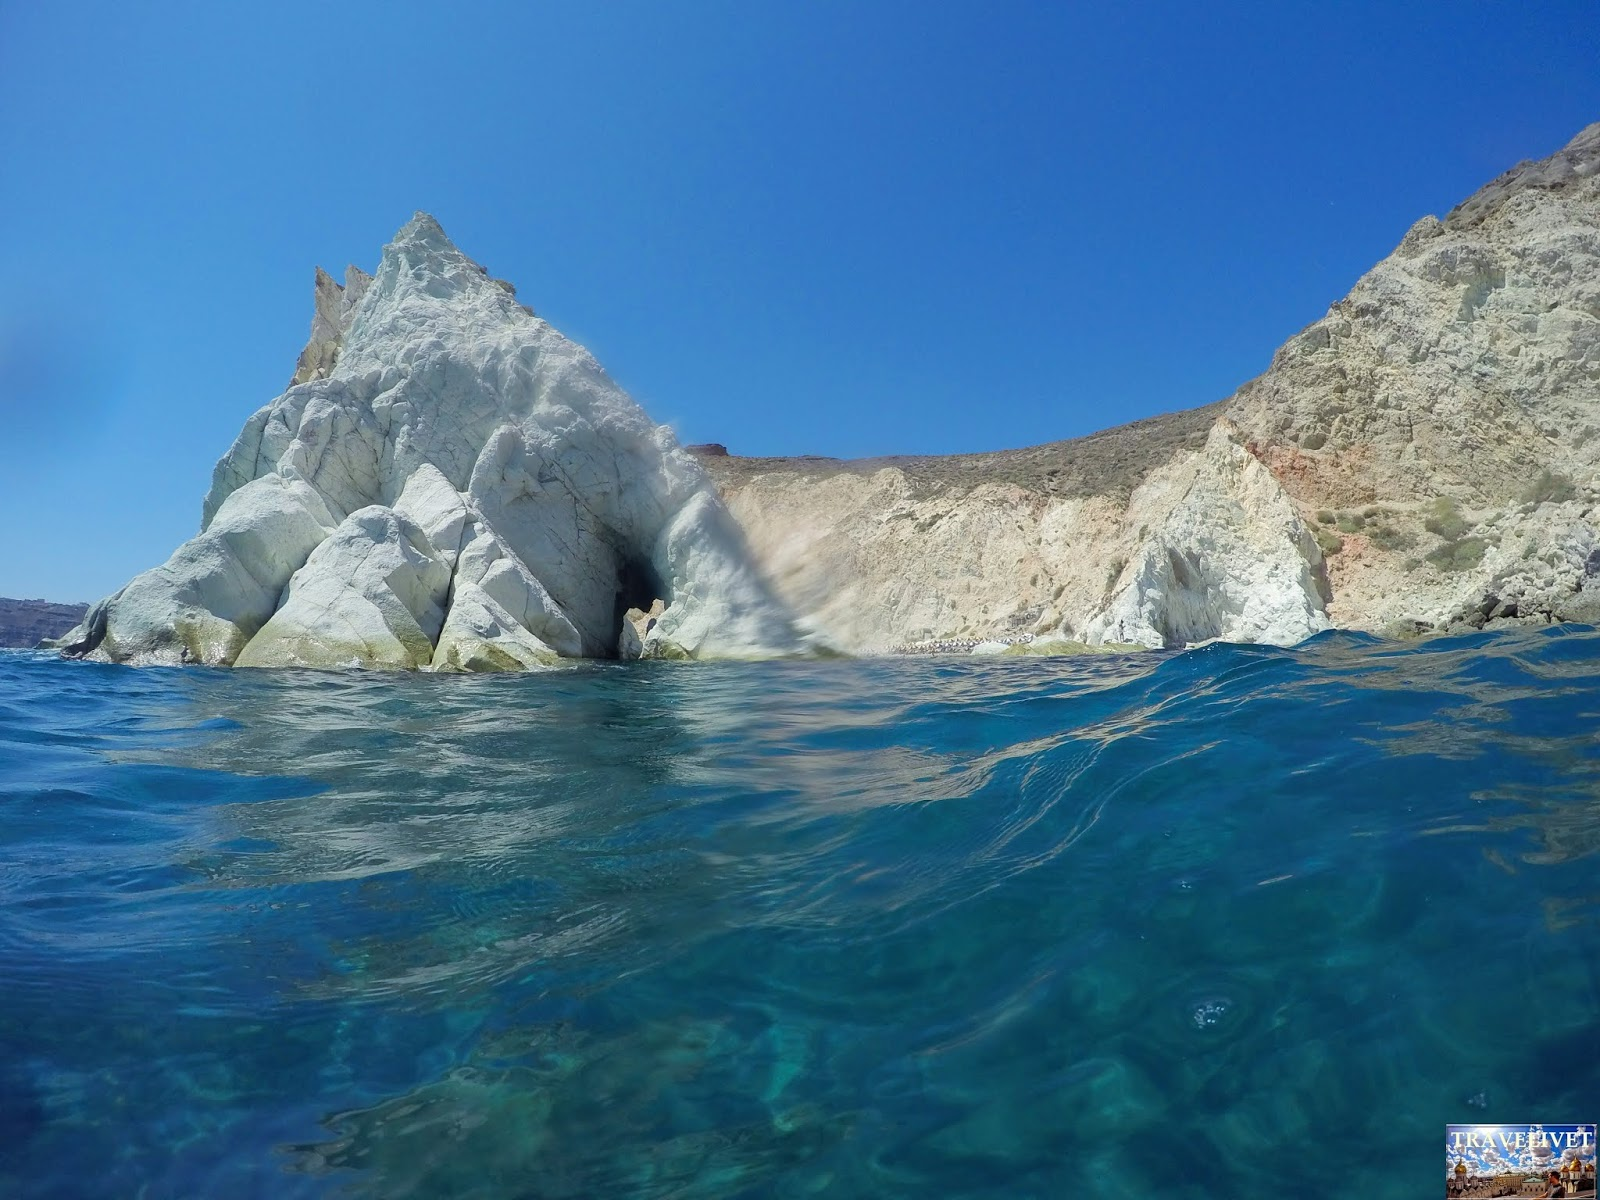 Grèce Santorini Santorin Plage blanche